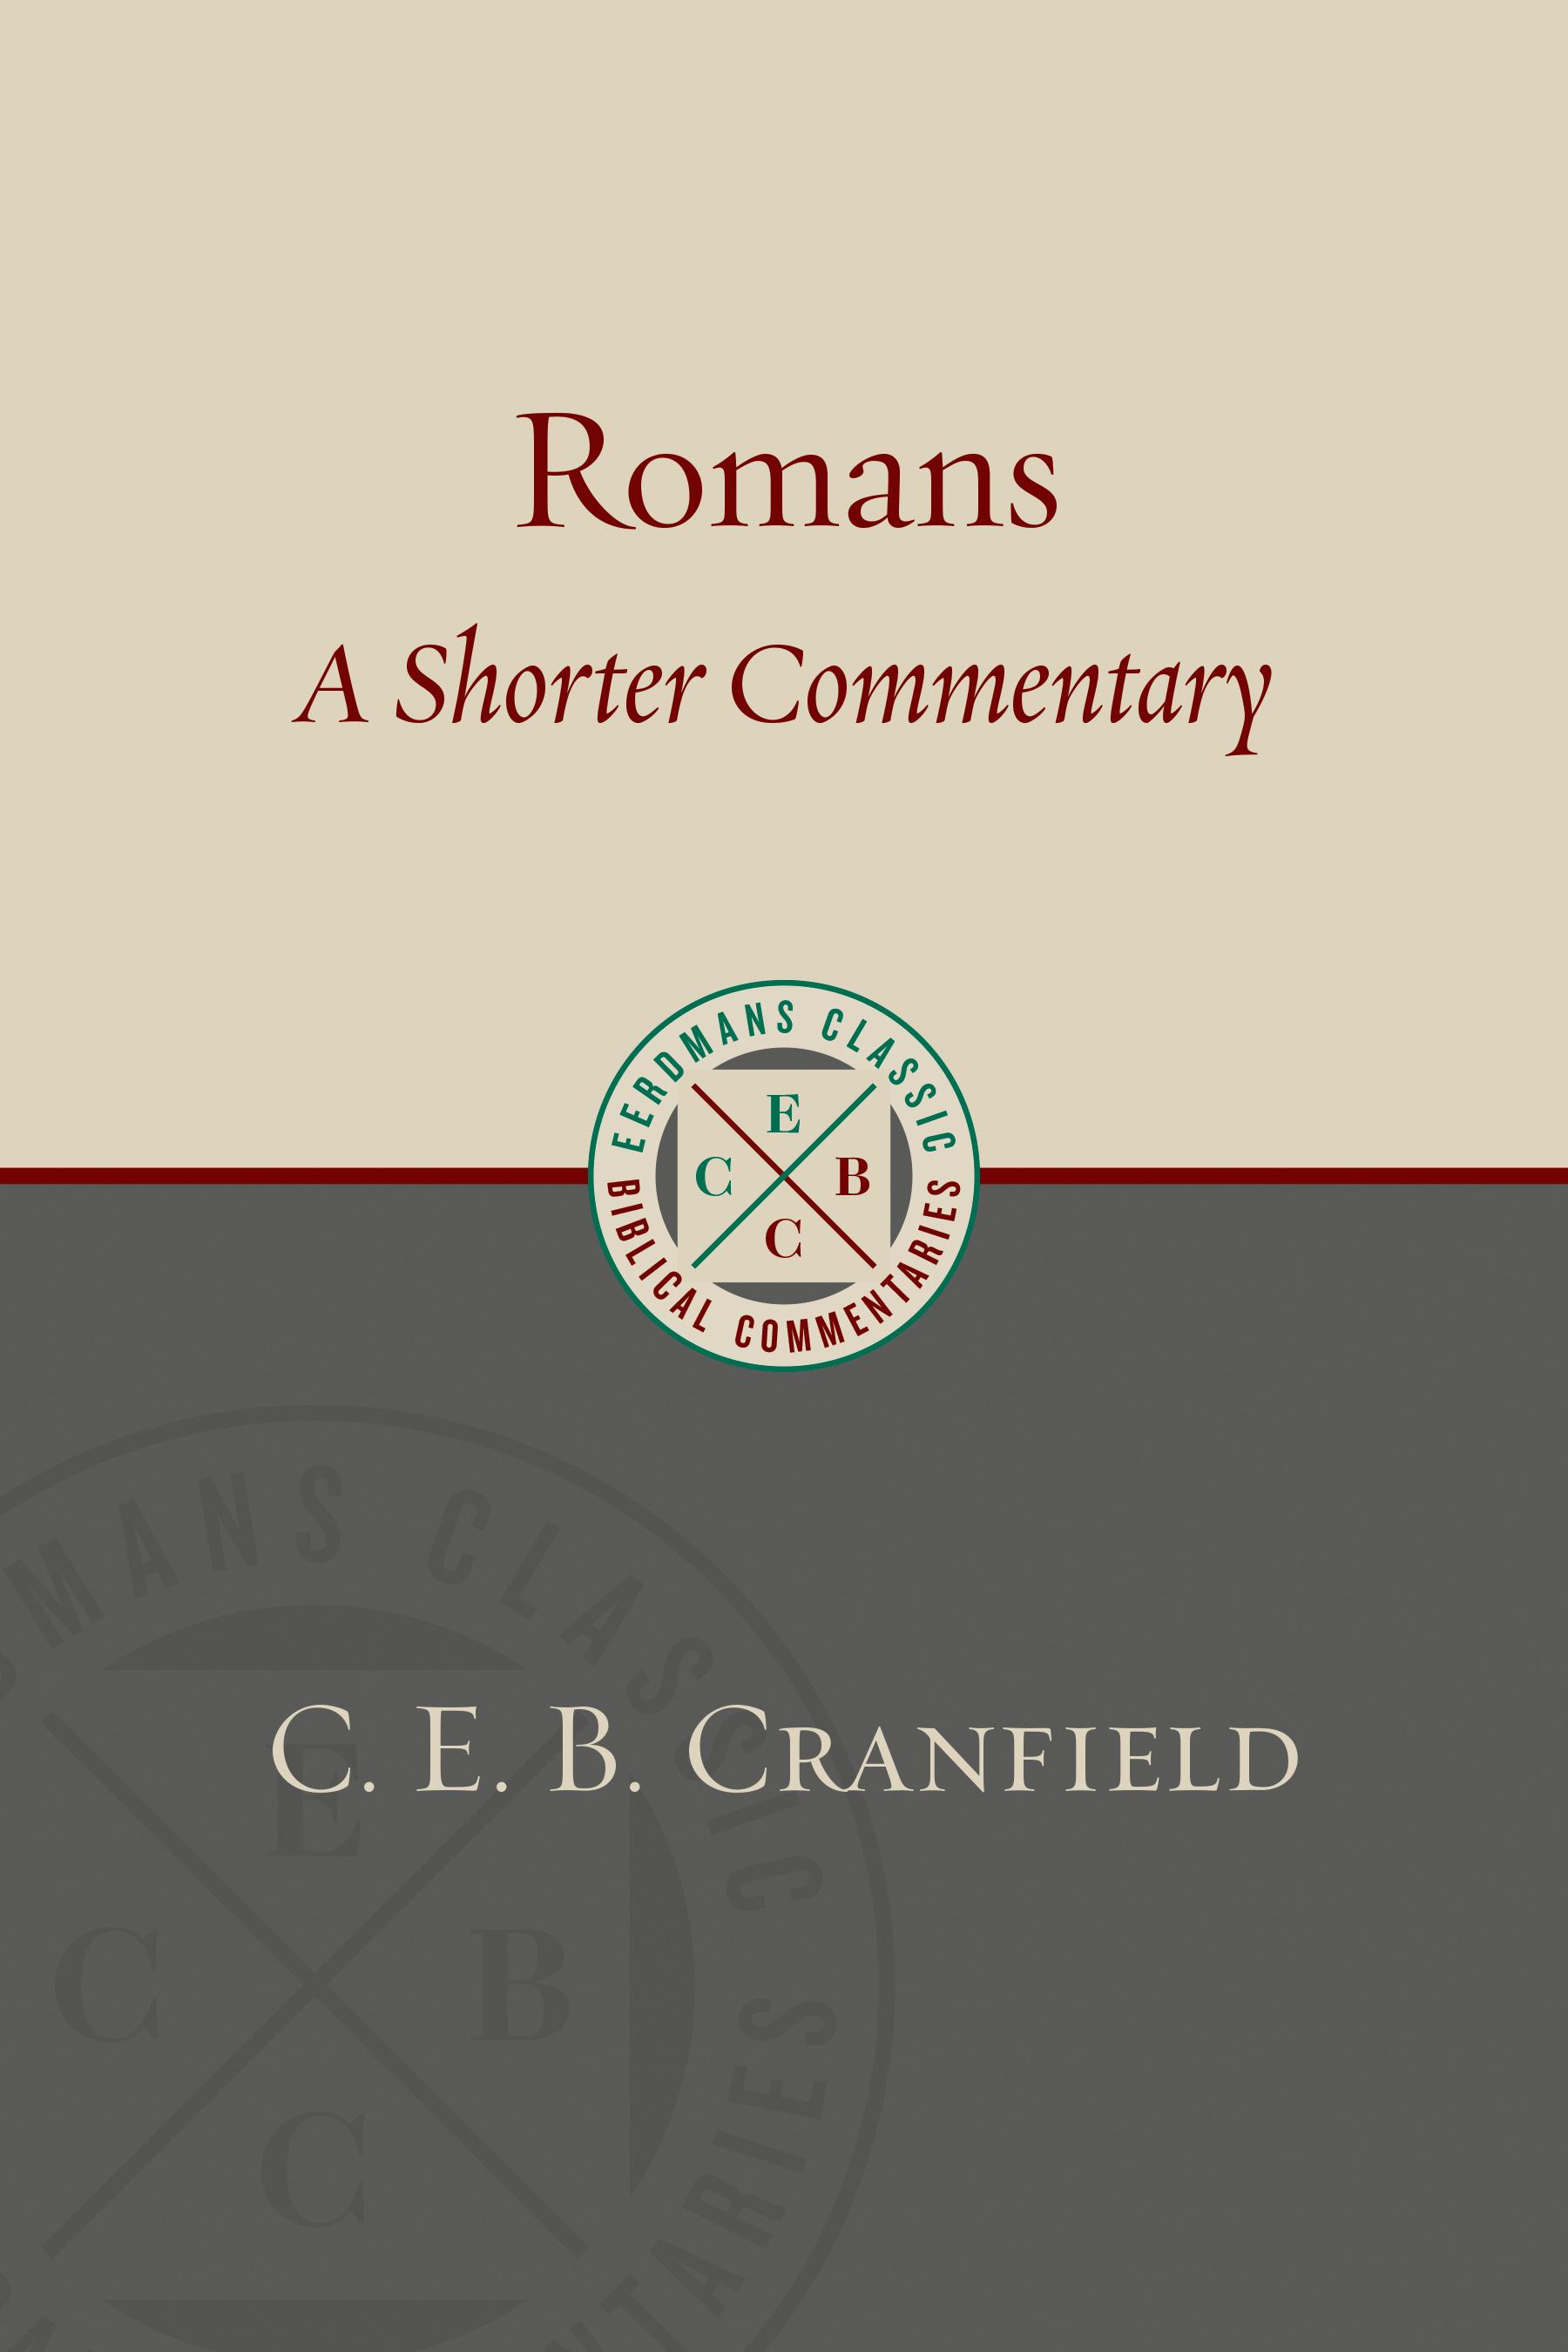 Book Review: C. E. B. Cranfield, Romans (Shorter Commentary)